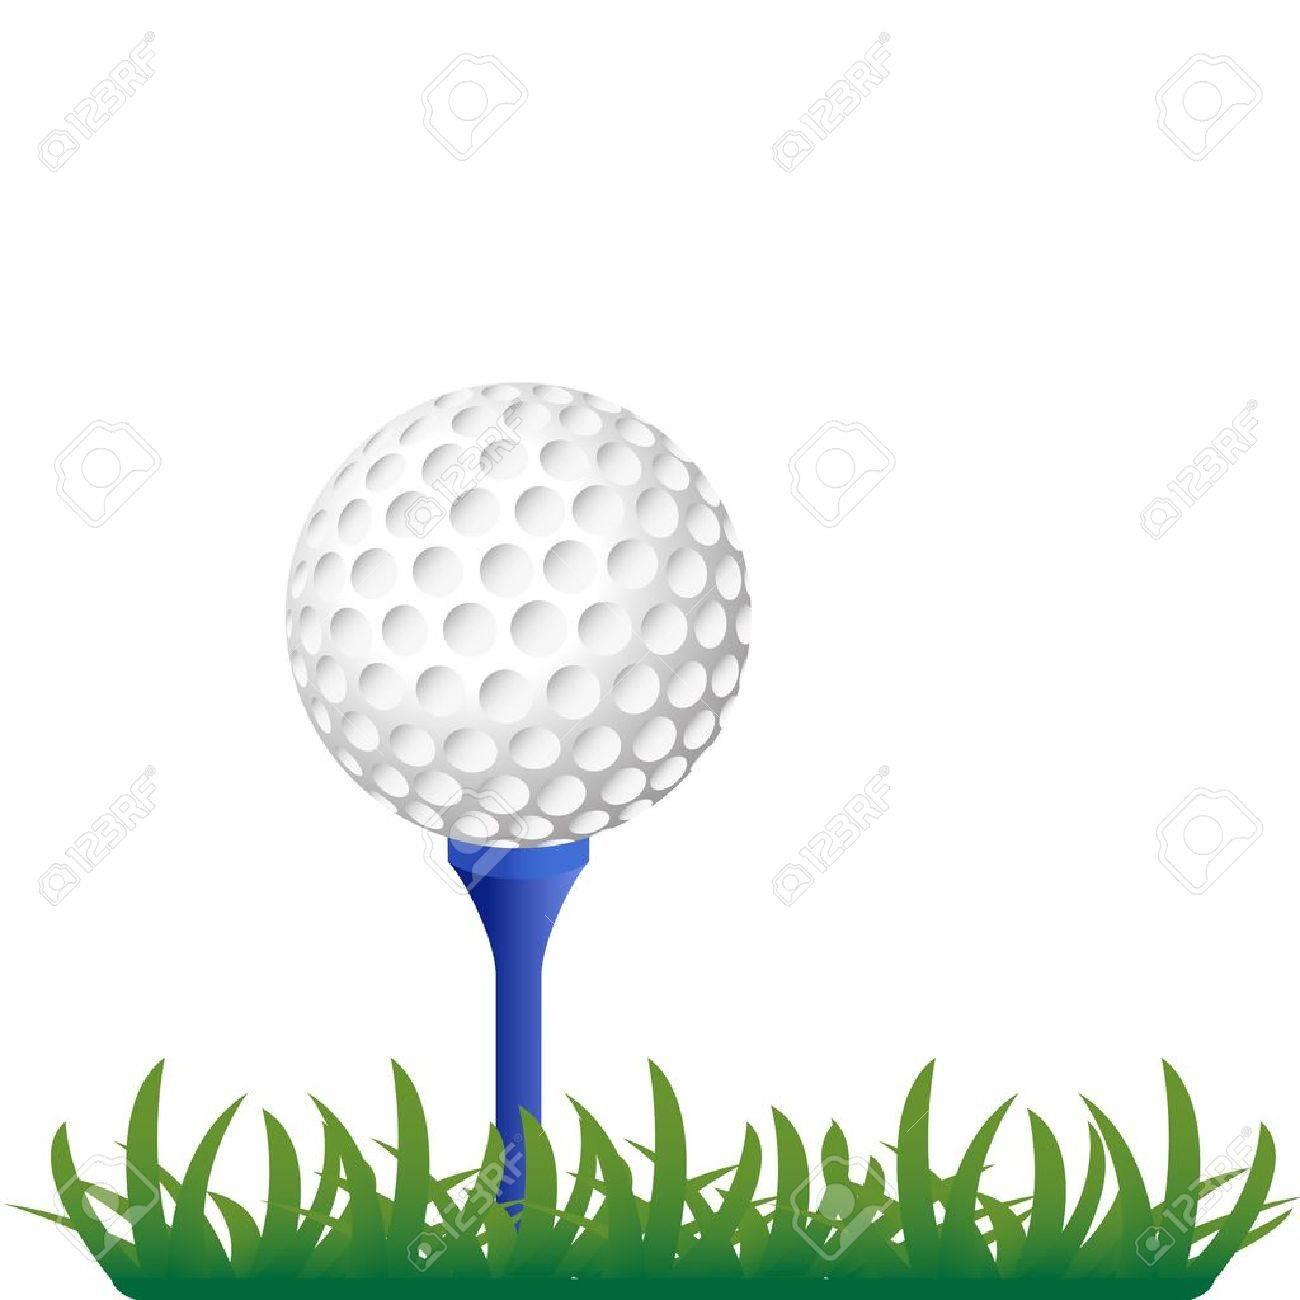 golf ball on grass illustration Stock Vector - 12430799